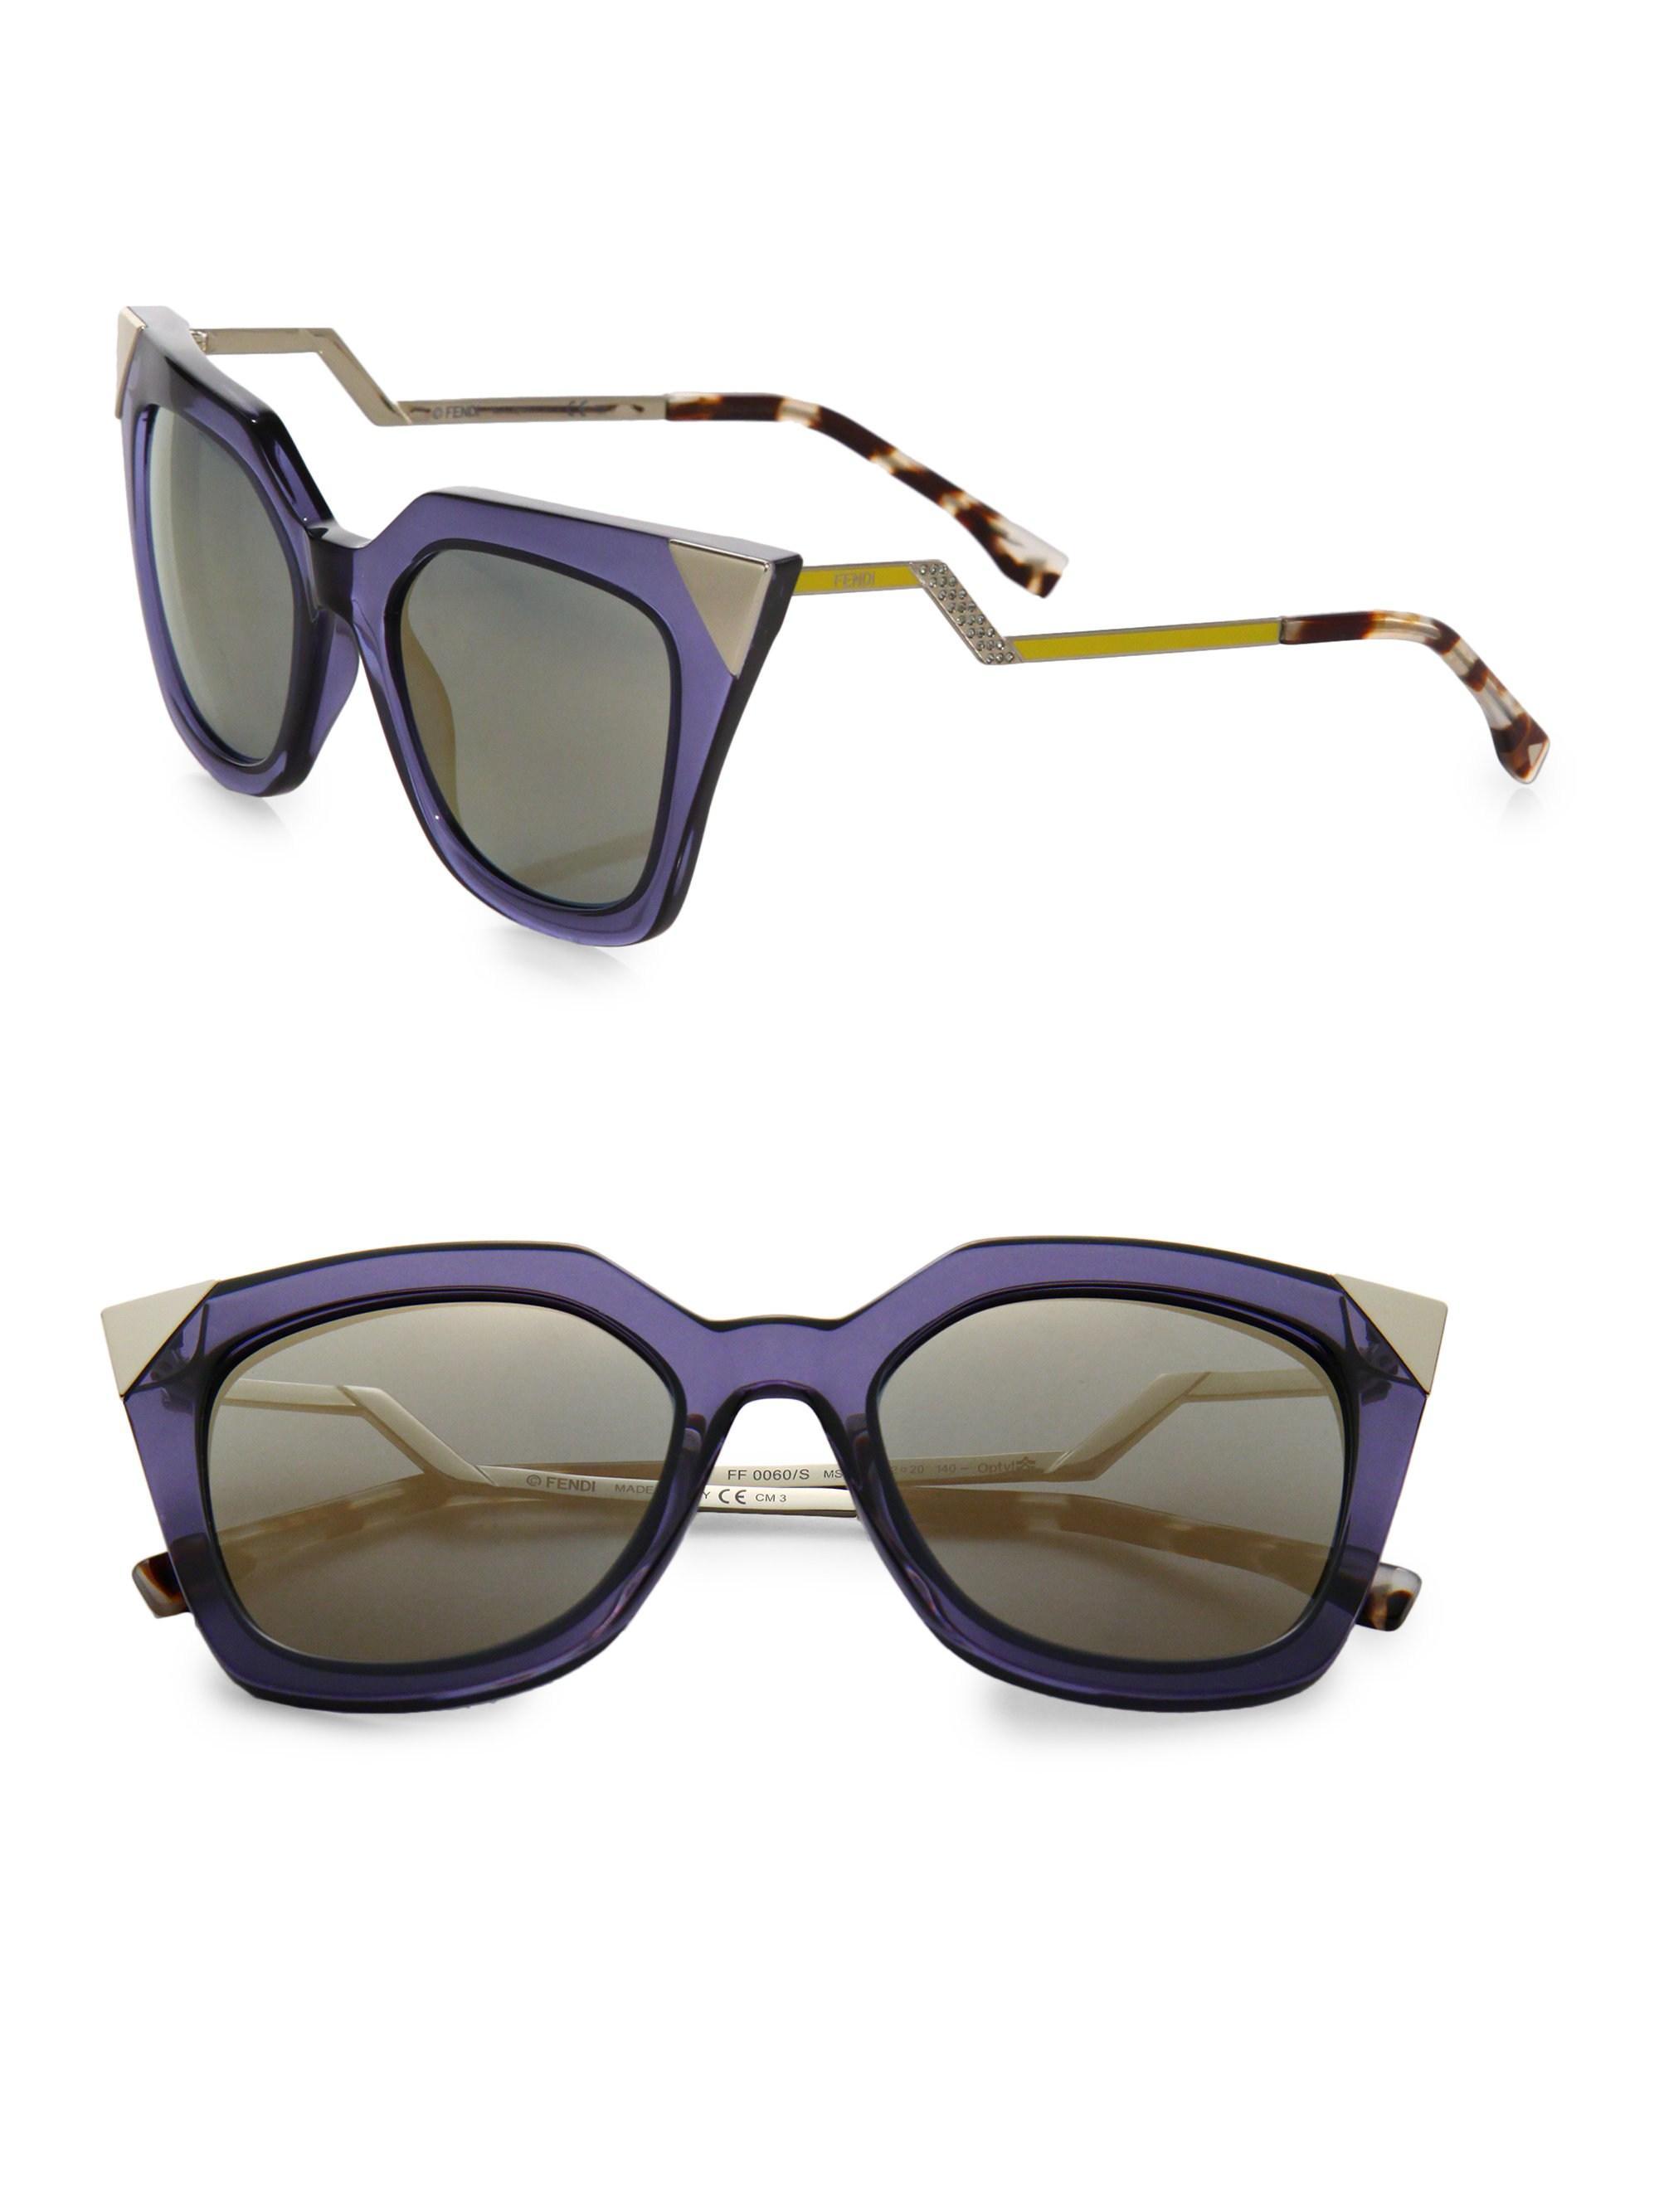 ce3f704b6 Fendi Zig-zag 52mm Cat Eye Sunglasses in Blue - Lyst